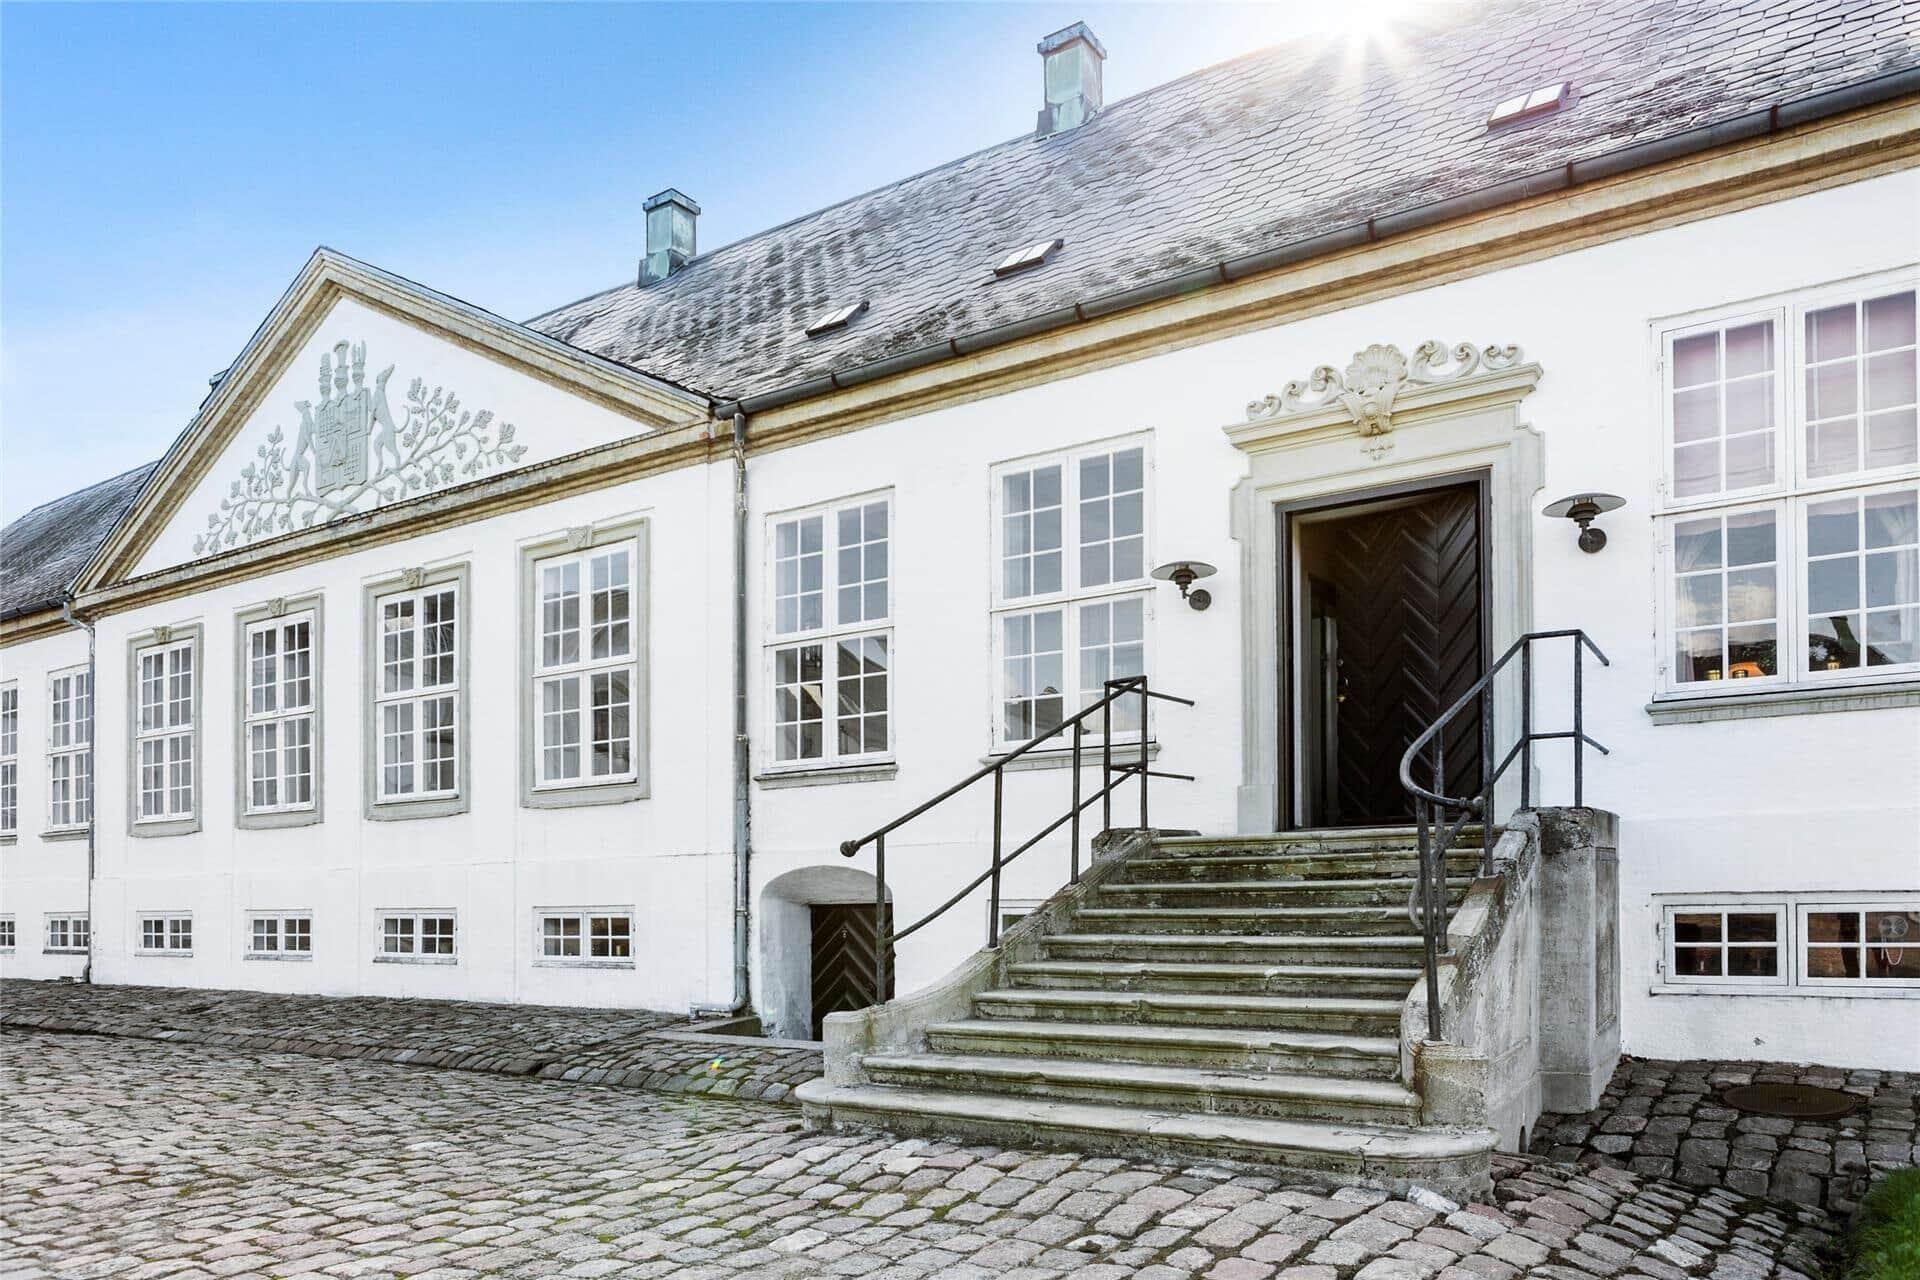 Bild 1-3 Ferienhaus S90015, Lerchenborg 5, DK - 4400 Kalundborg